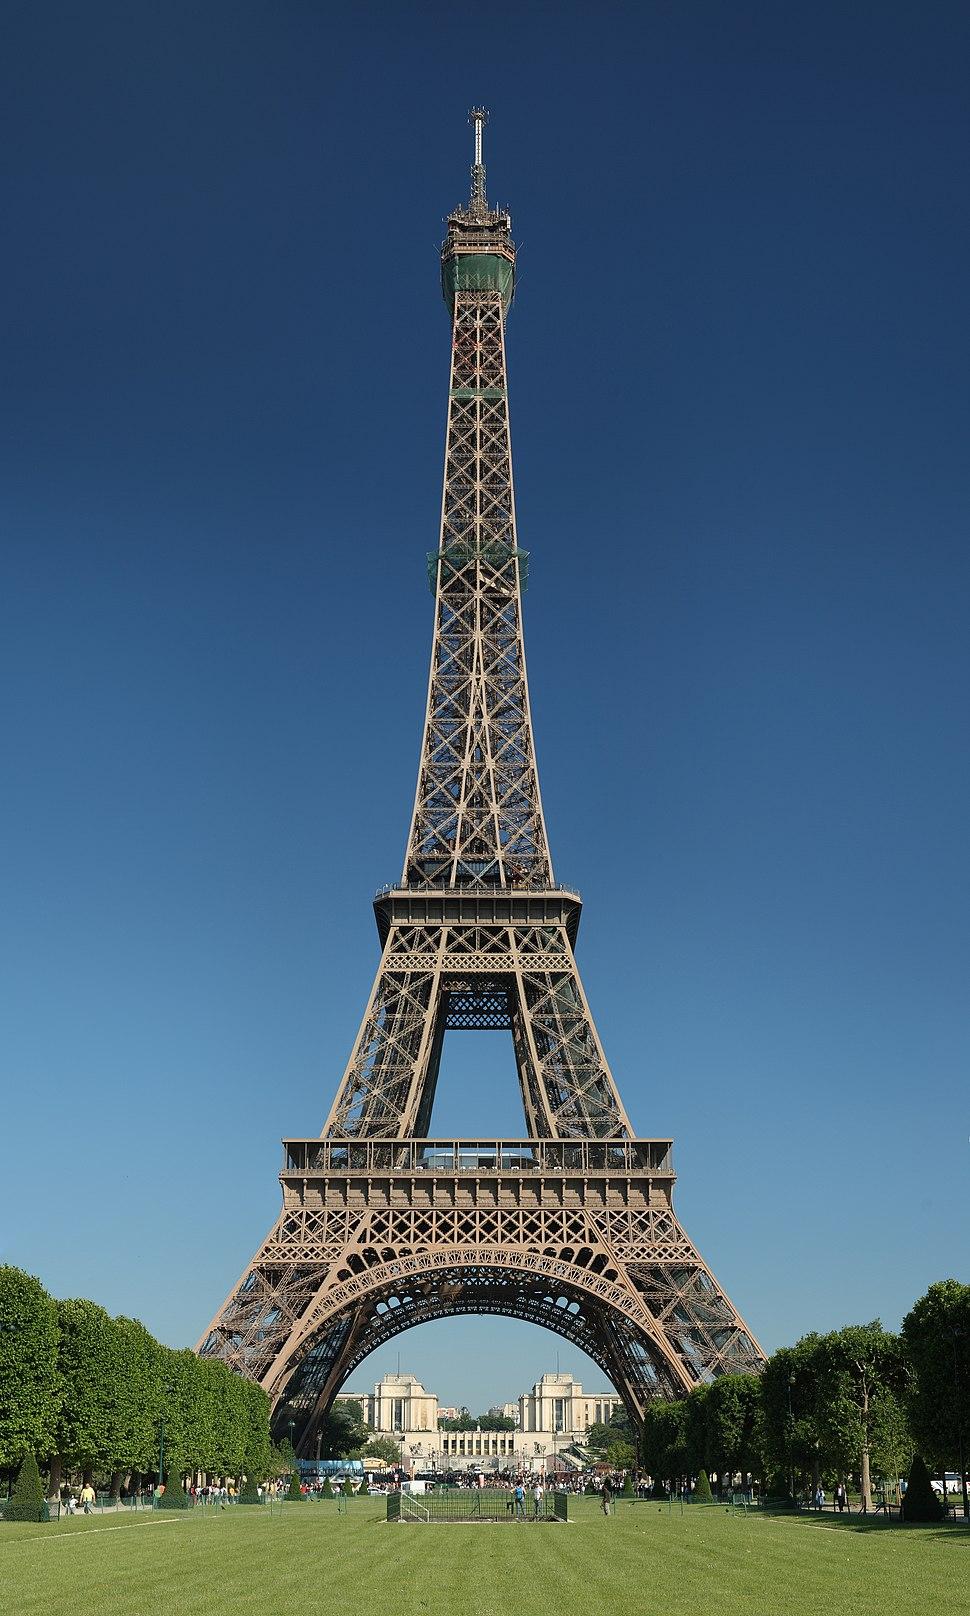 Tour Eiffel Wikimedia Commons (cropped)